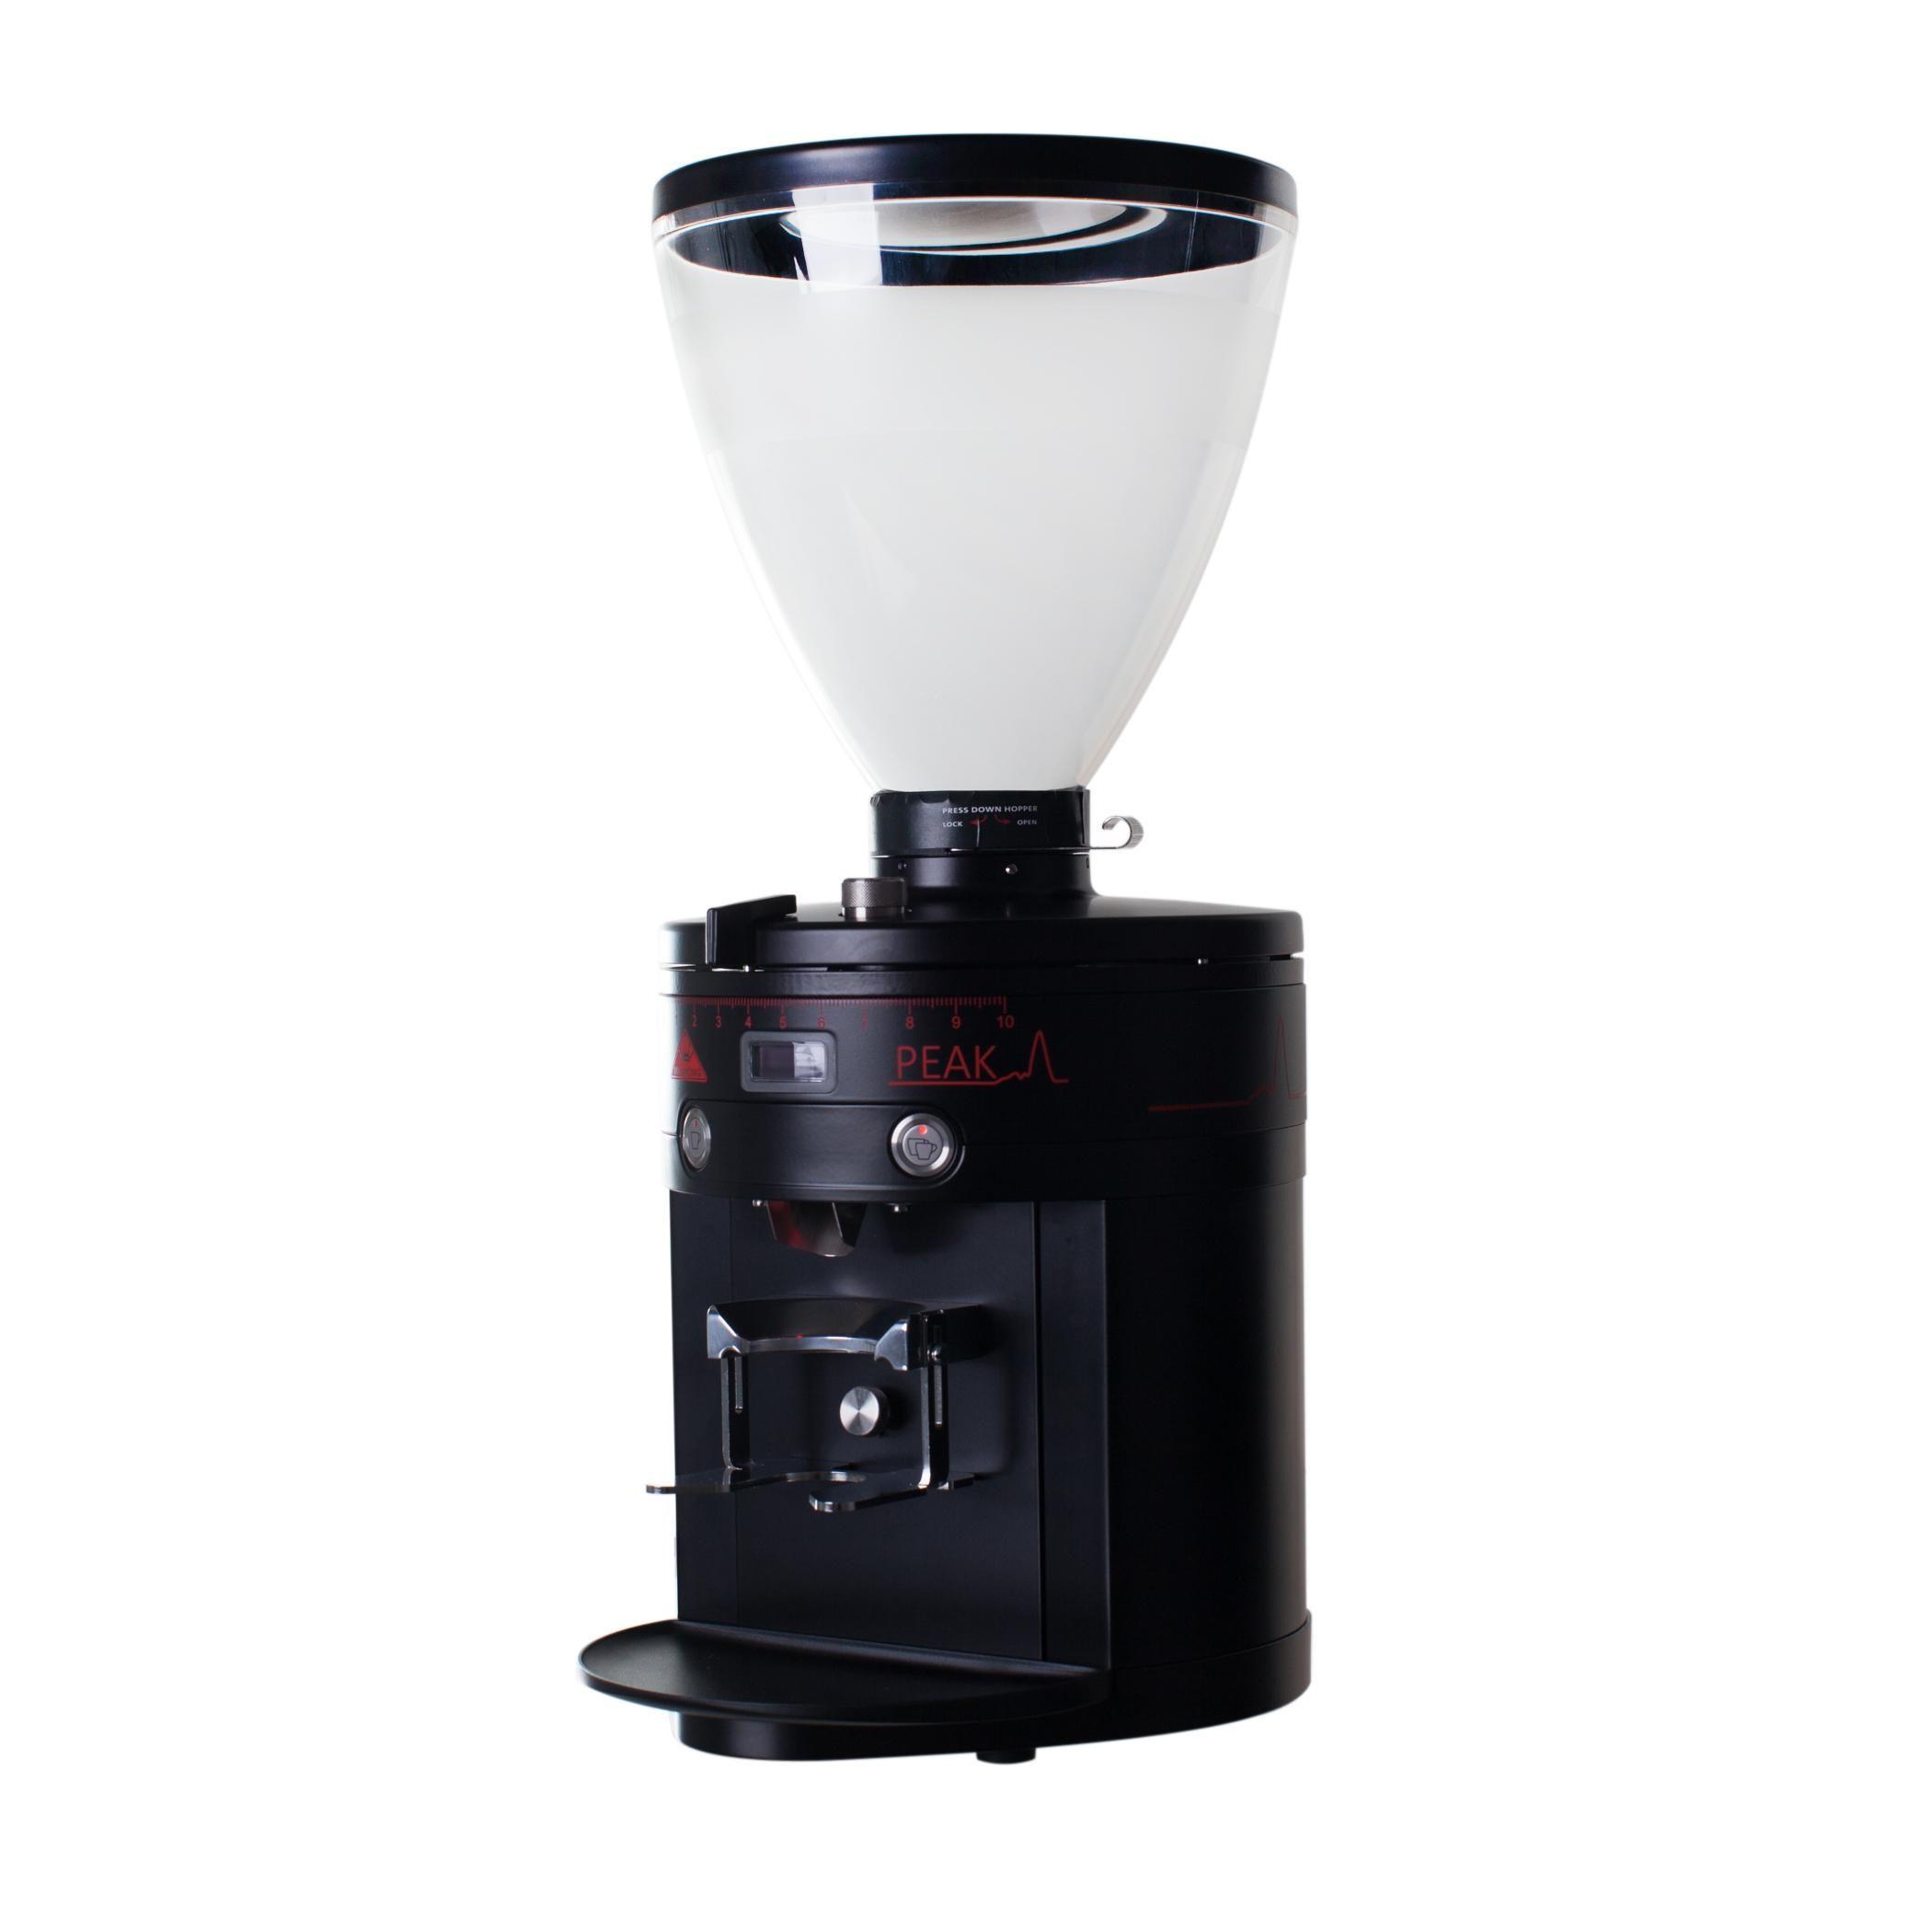 Mahlkönig K30 ES Kaffee- und Espressomühle